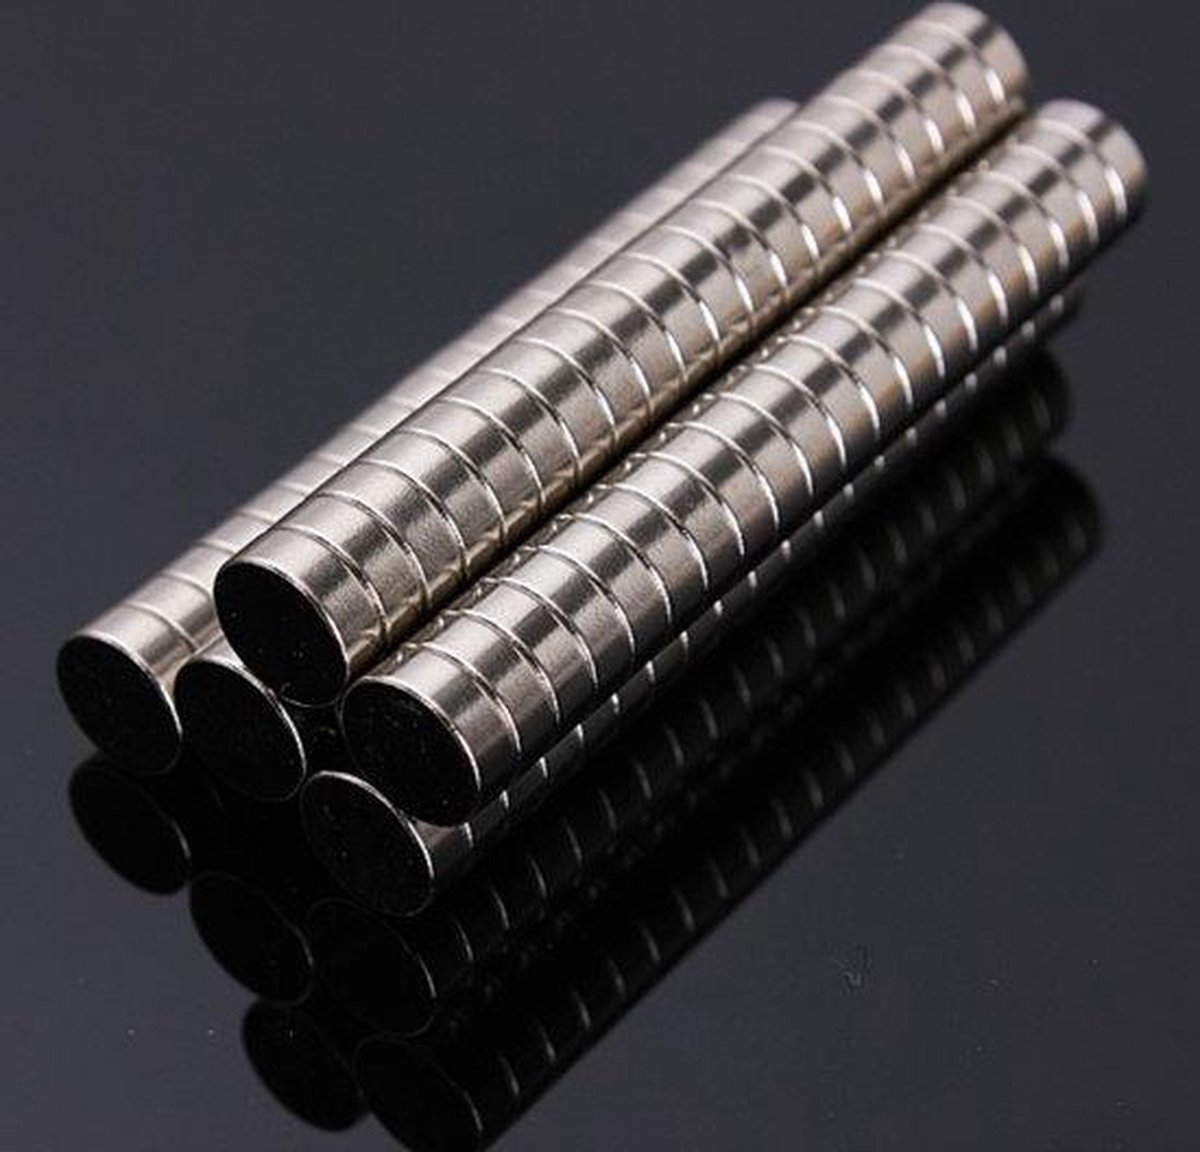 Super sterke magneten - Neodymium - Rond - 5 x 3 mm - 20 Stuks - Zilver